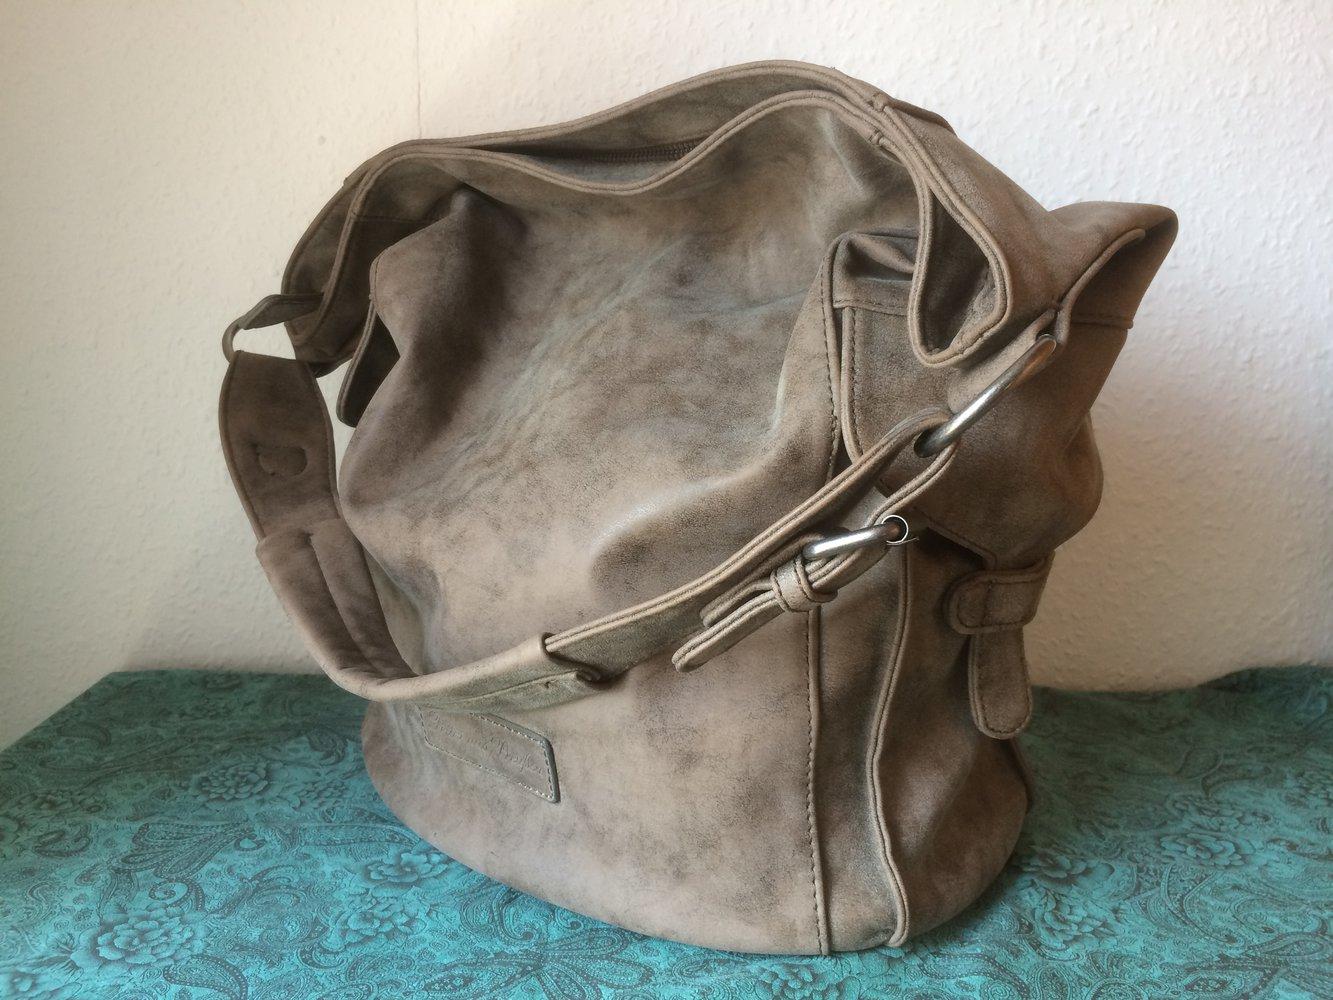 1d9a0ea058b77 Fritzi Aus Preußen - Fritzi aus Preußen Judy Vintage Handtasche ...